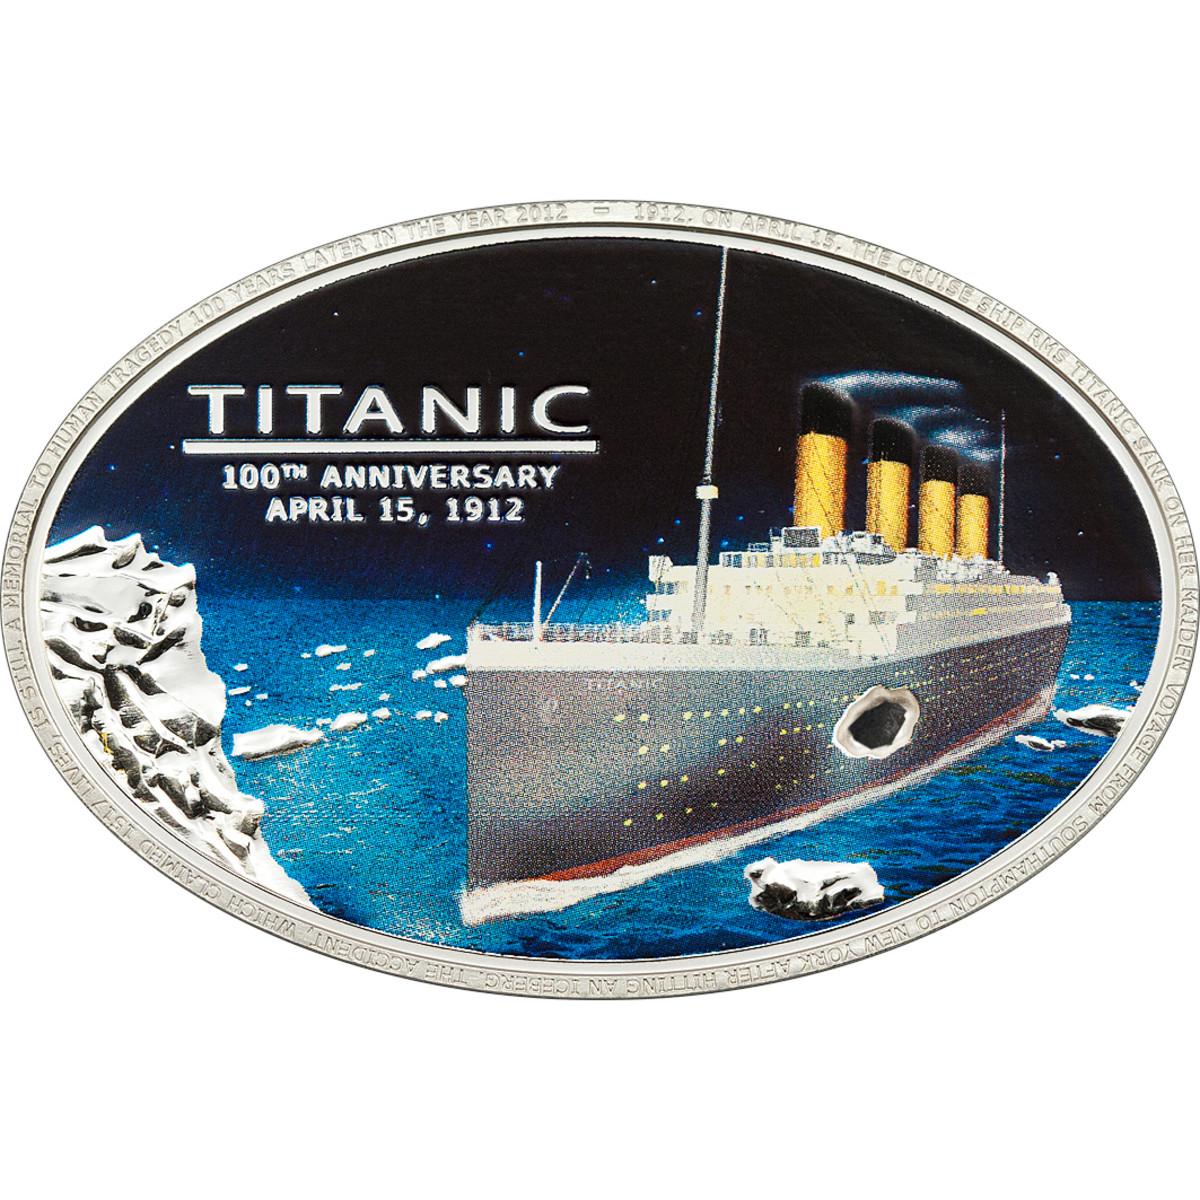 Titanic Cook Island Oval with coal